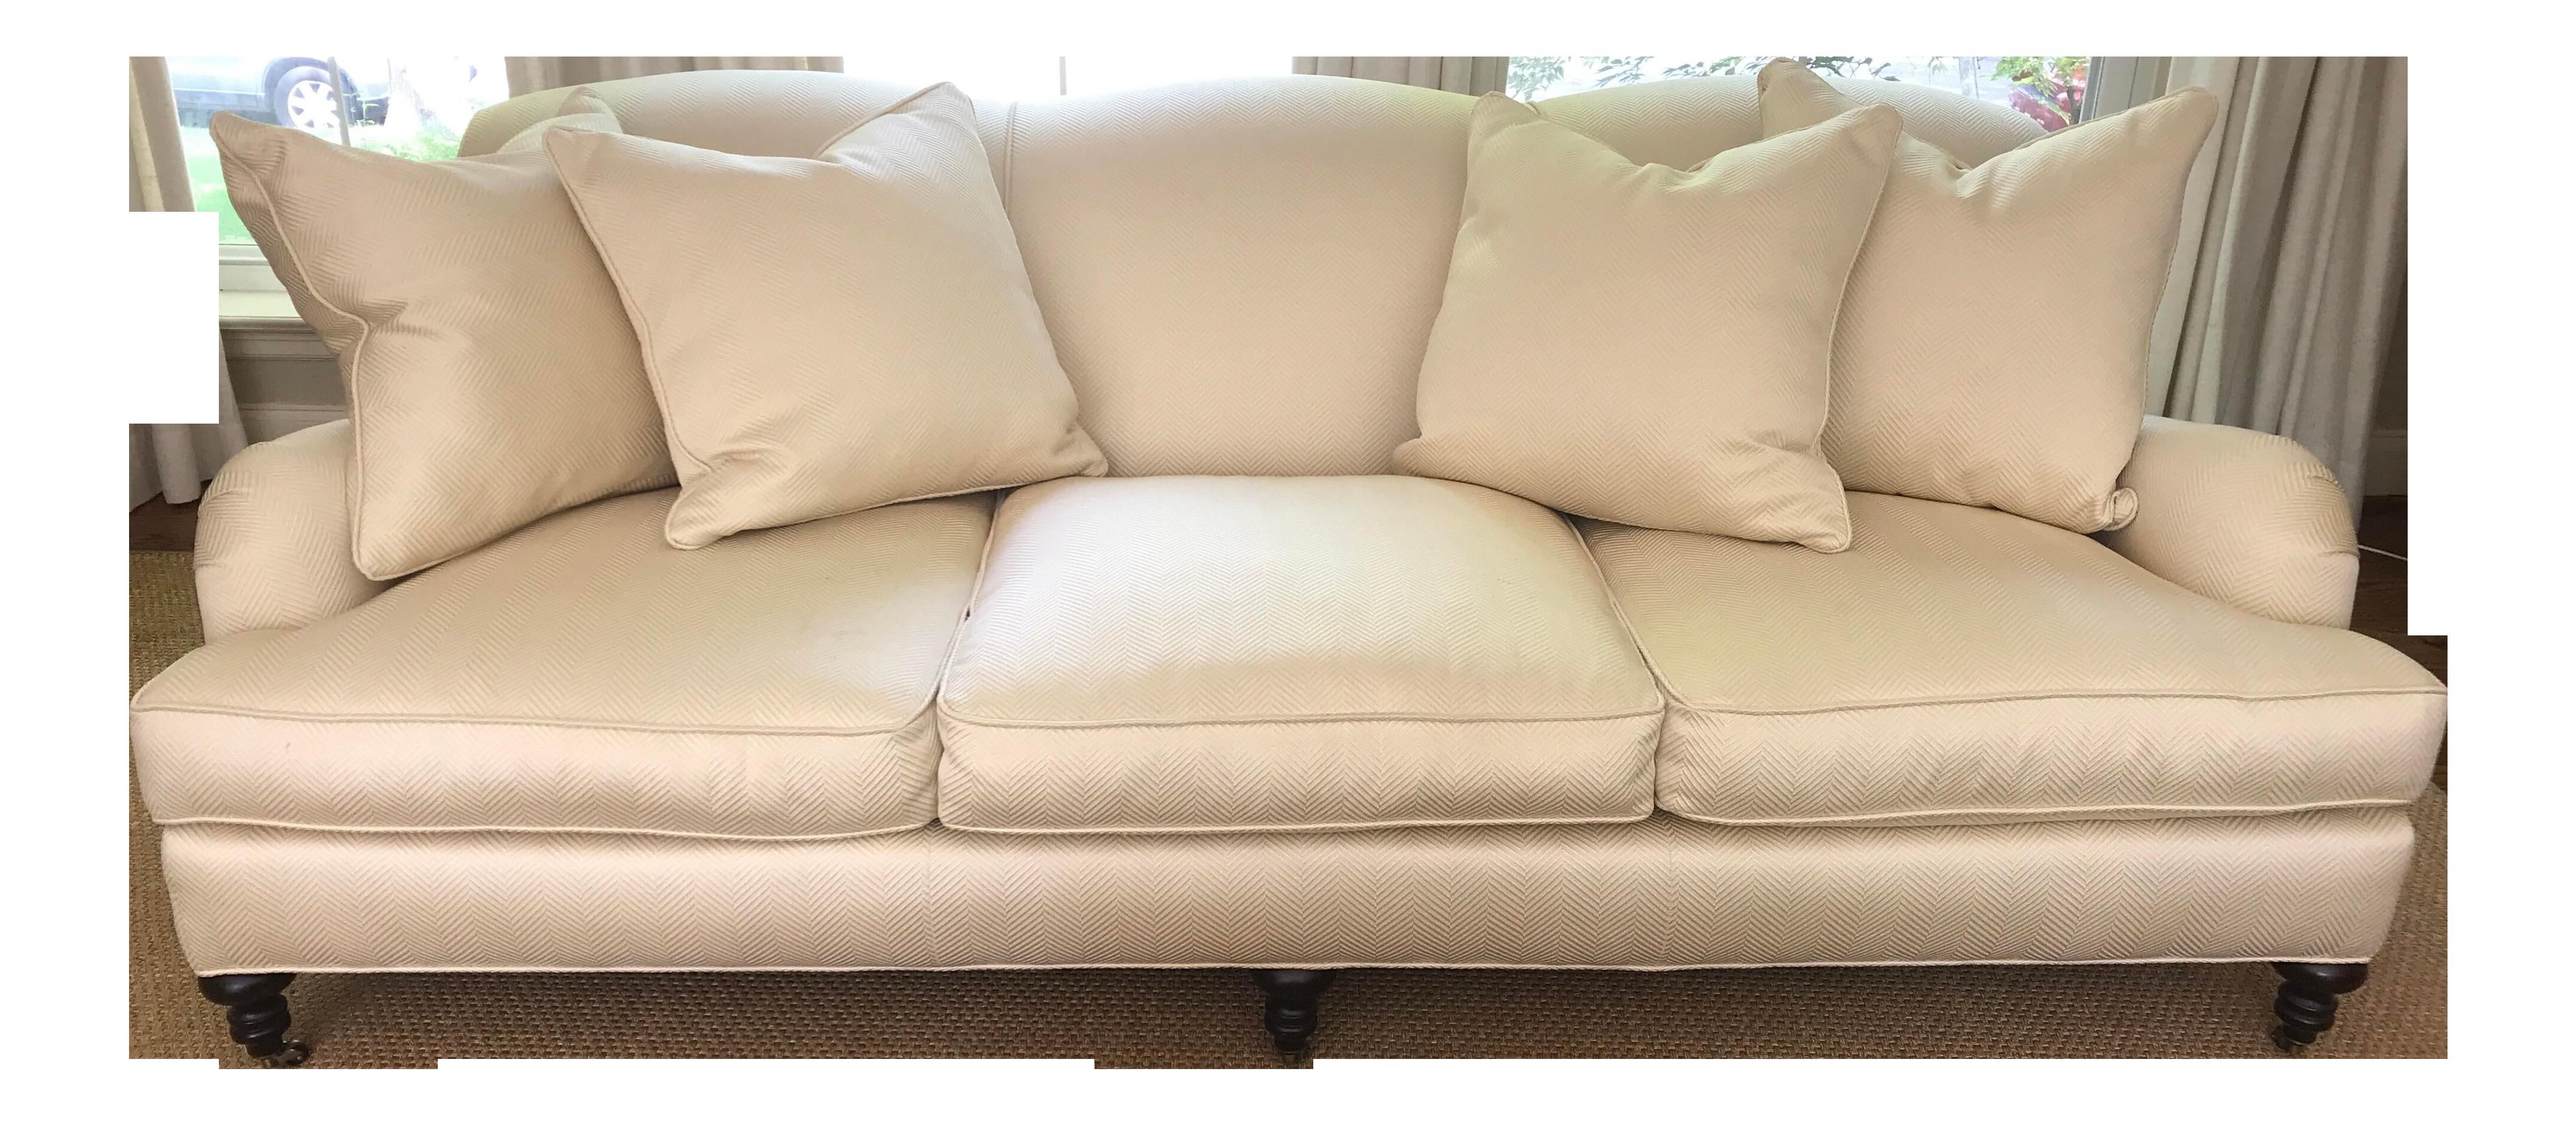 Astounding Herringbone English Style 3 Seat Sofa Creativecarmelina Interior Chair Design Creativecarmelinacom